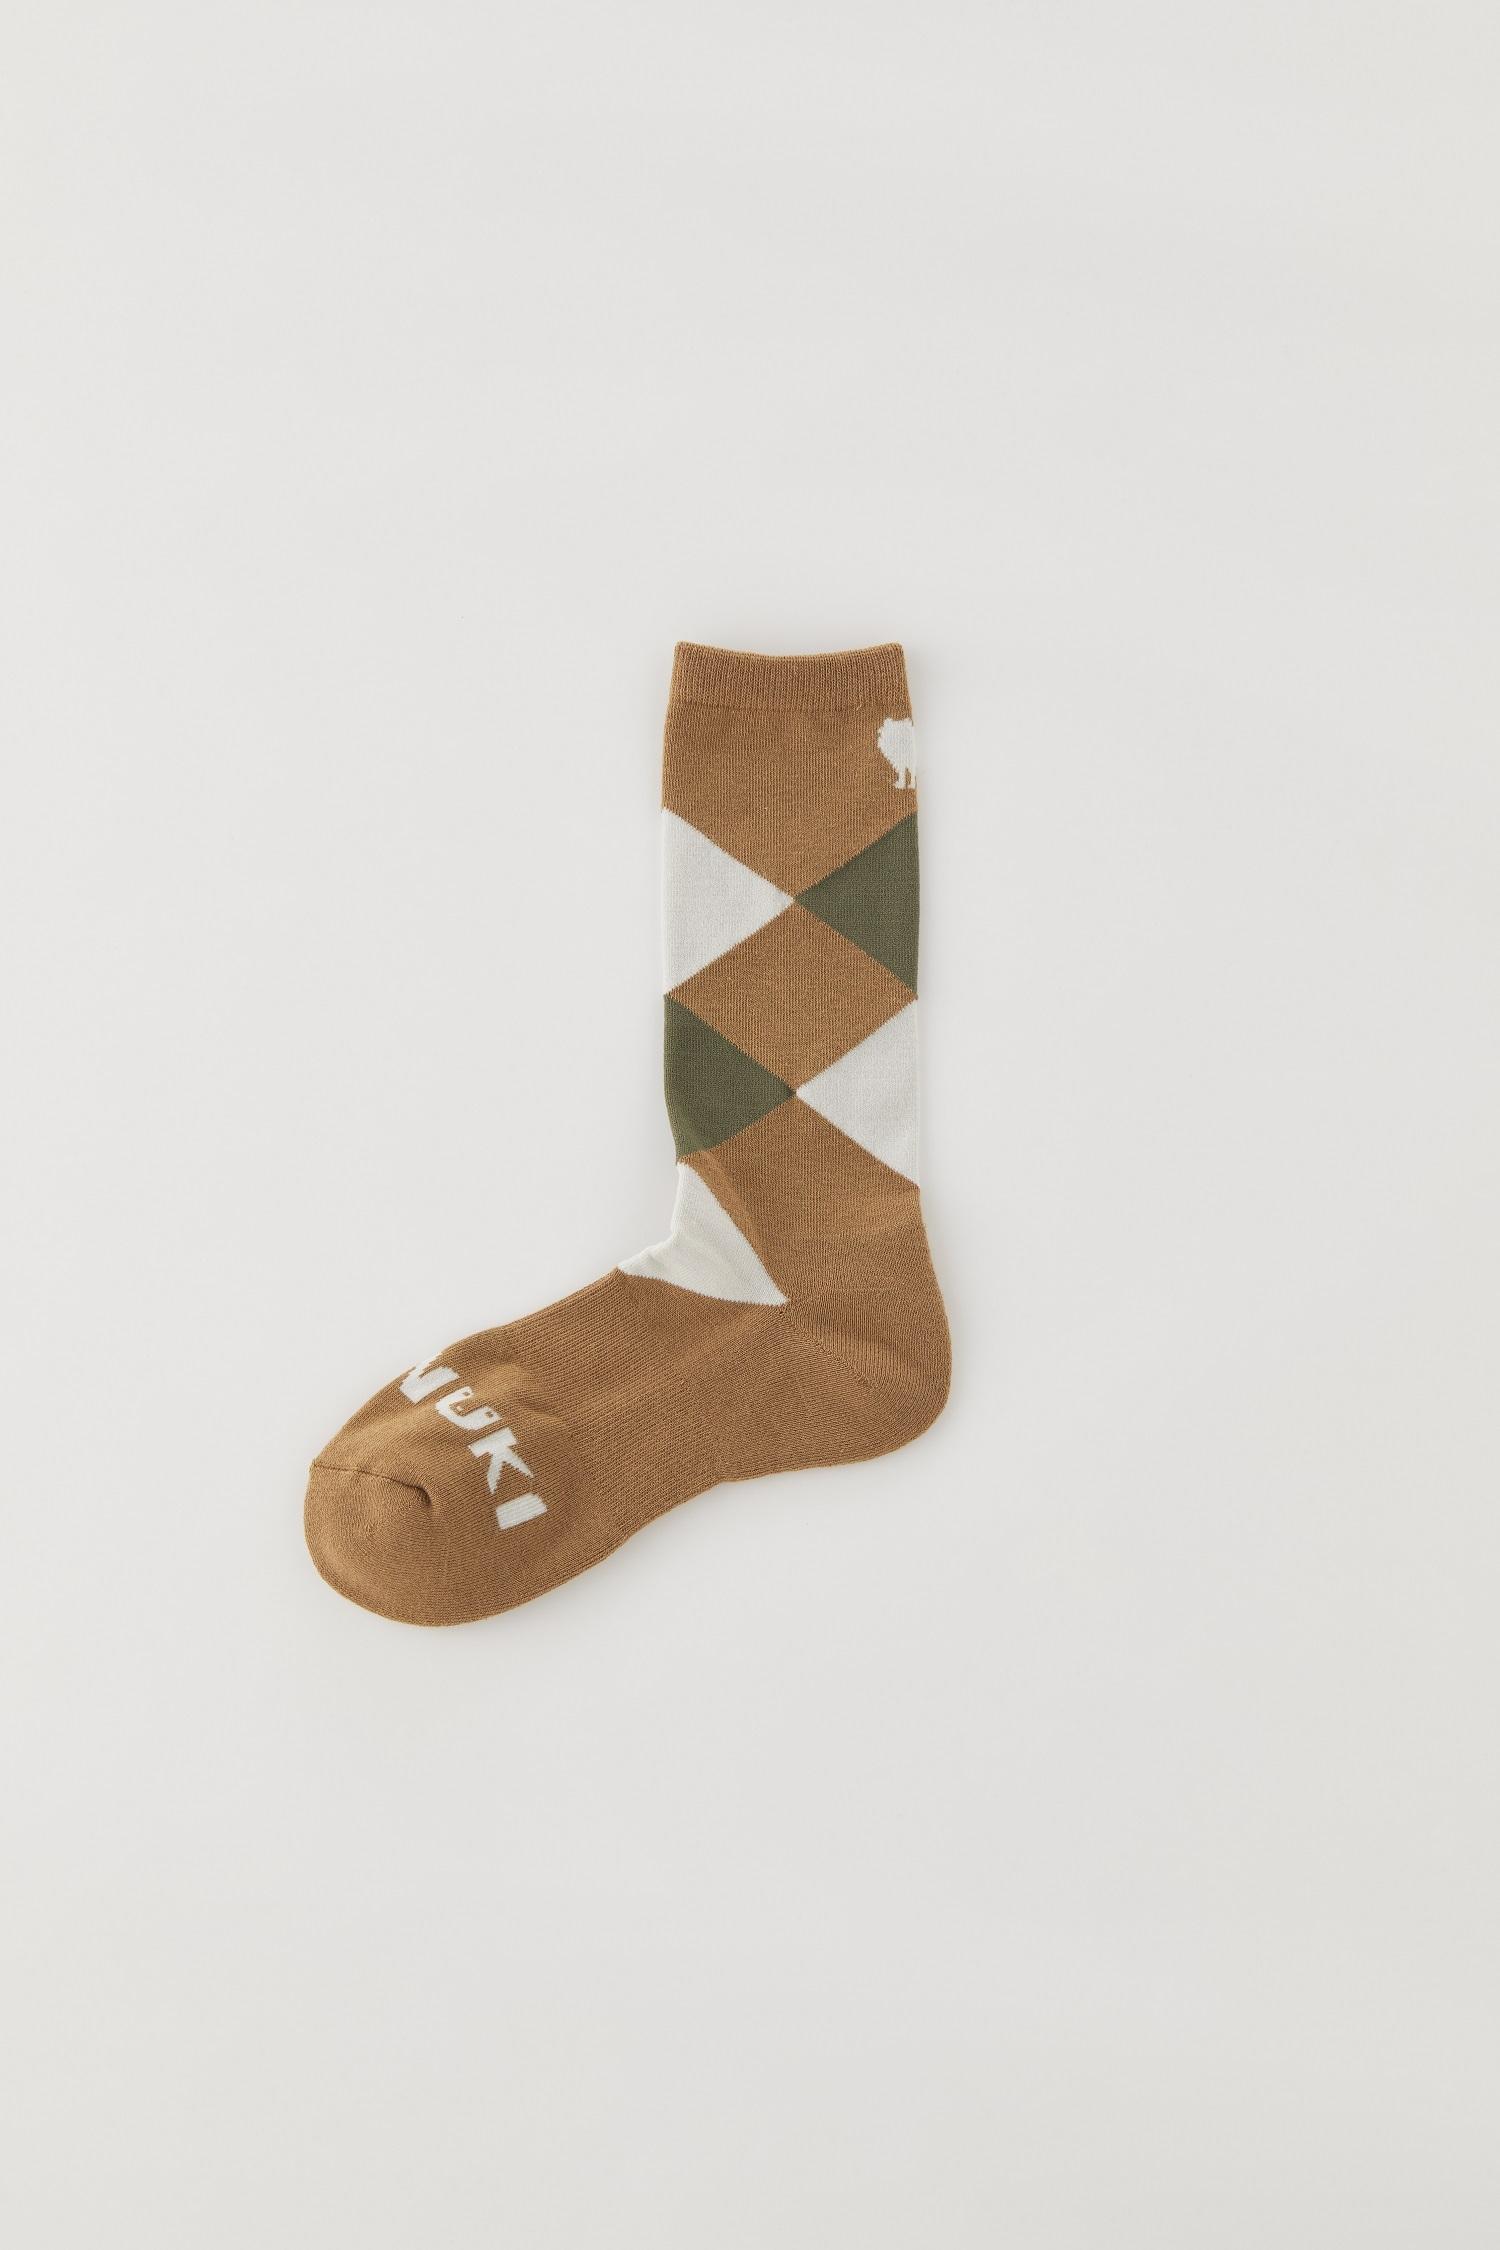 Sato Tetra Socks: Color Camel